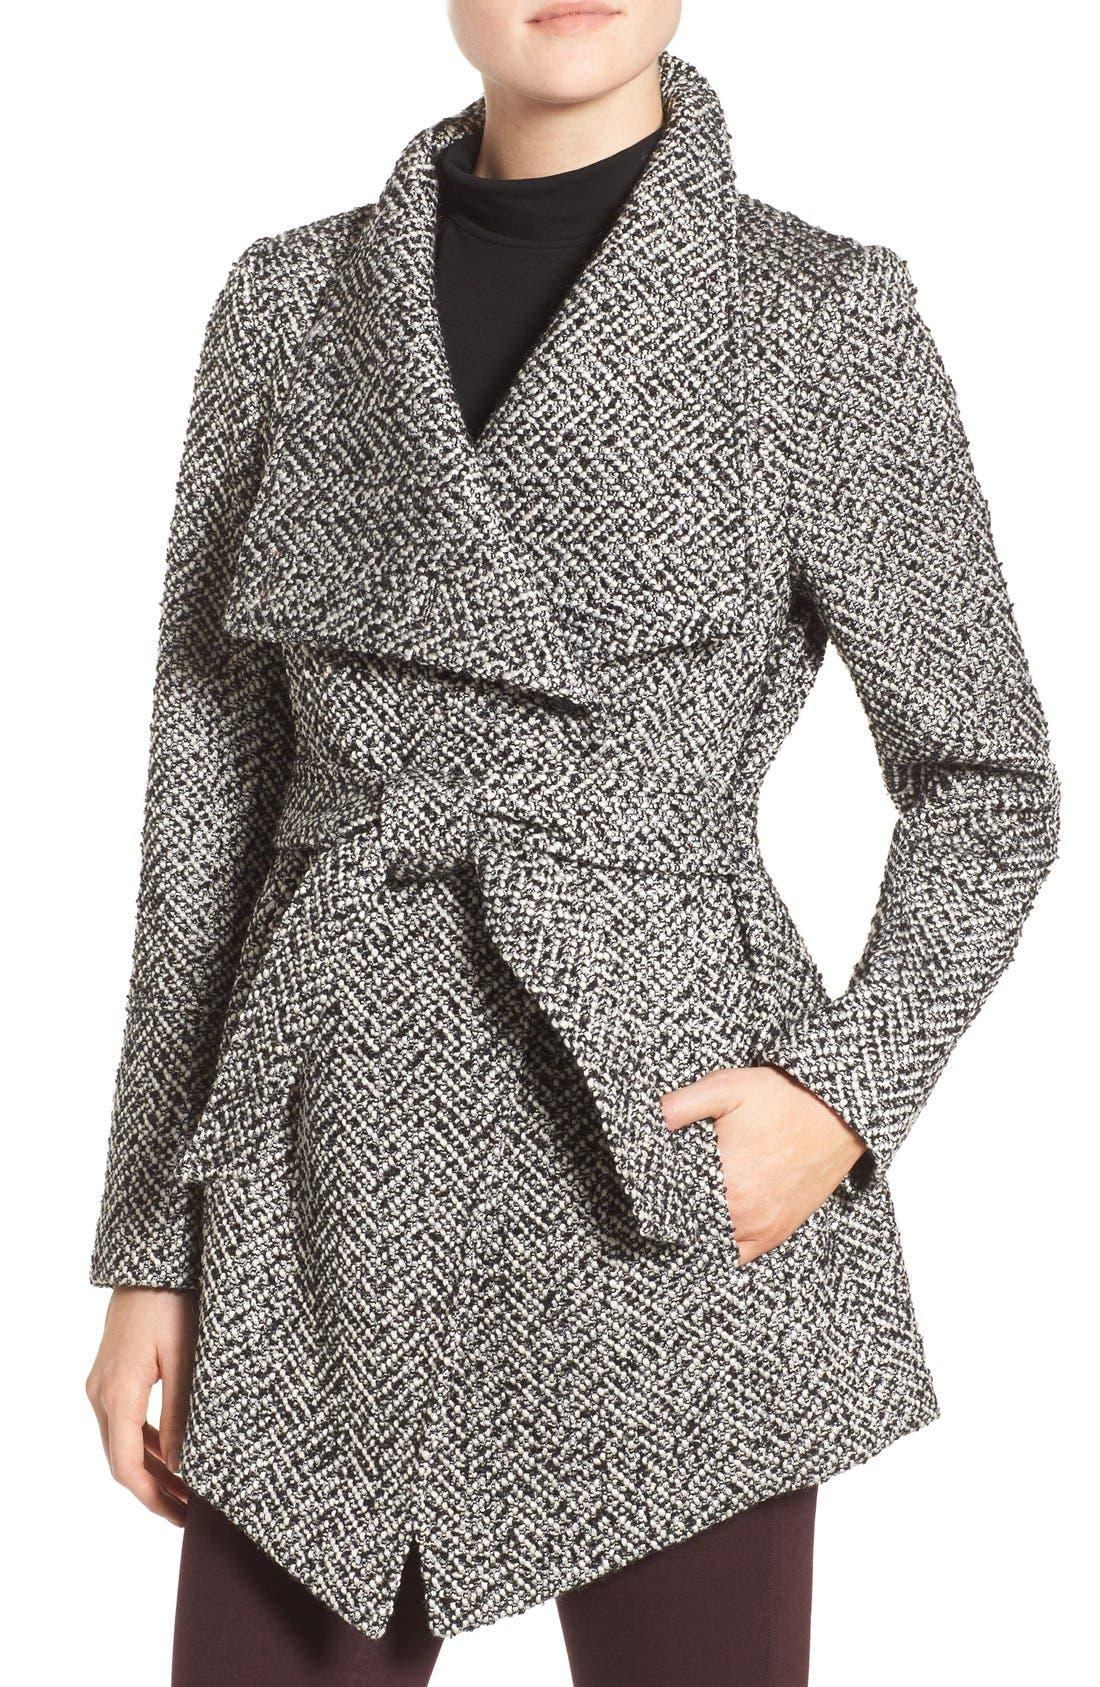 Alternate Image 1 Selected - Jessica Simpson Belted Tweed Coat